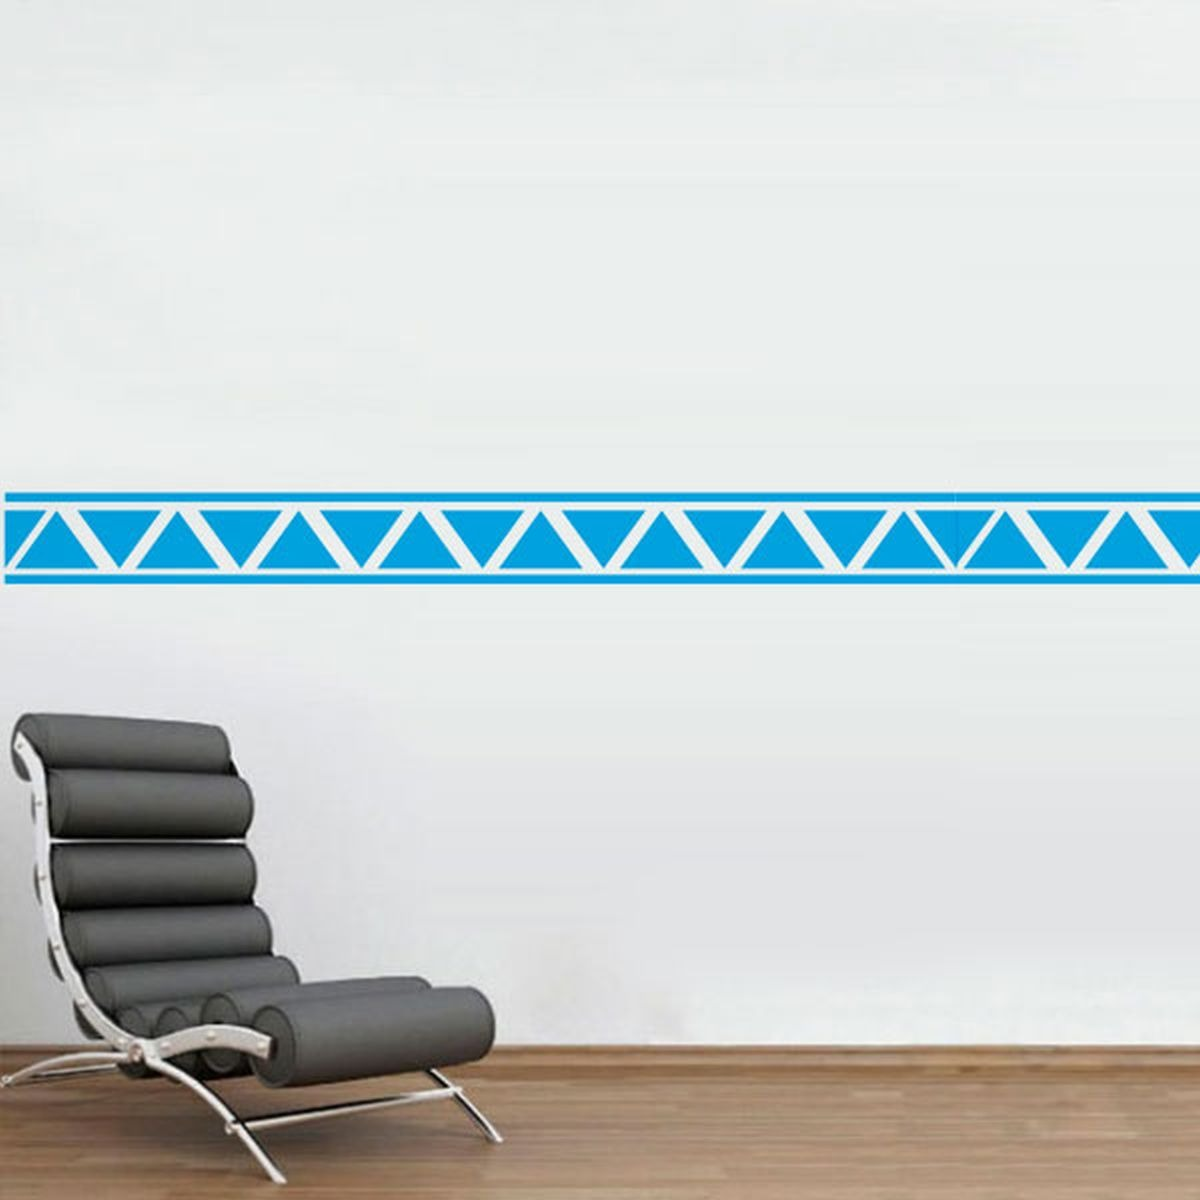 a98093406 adesivo de parede faixa decorativa estrelas bege. Carregando zoom.